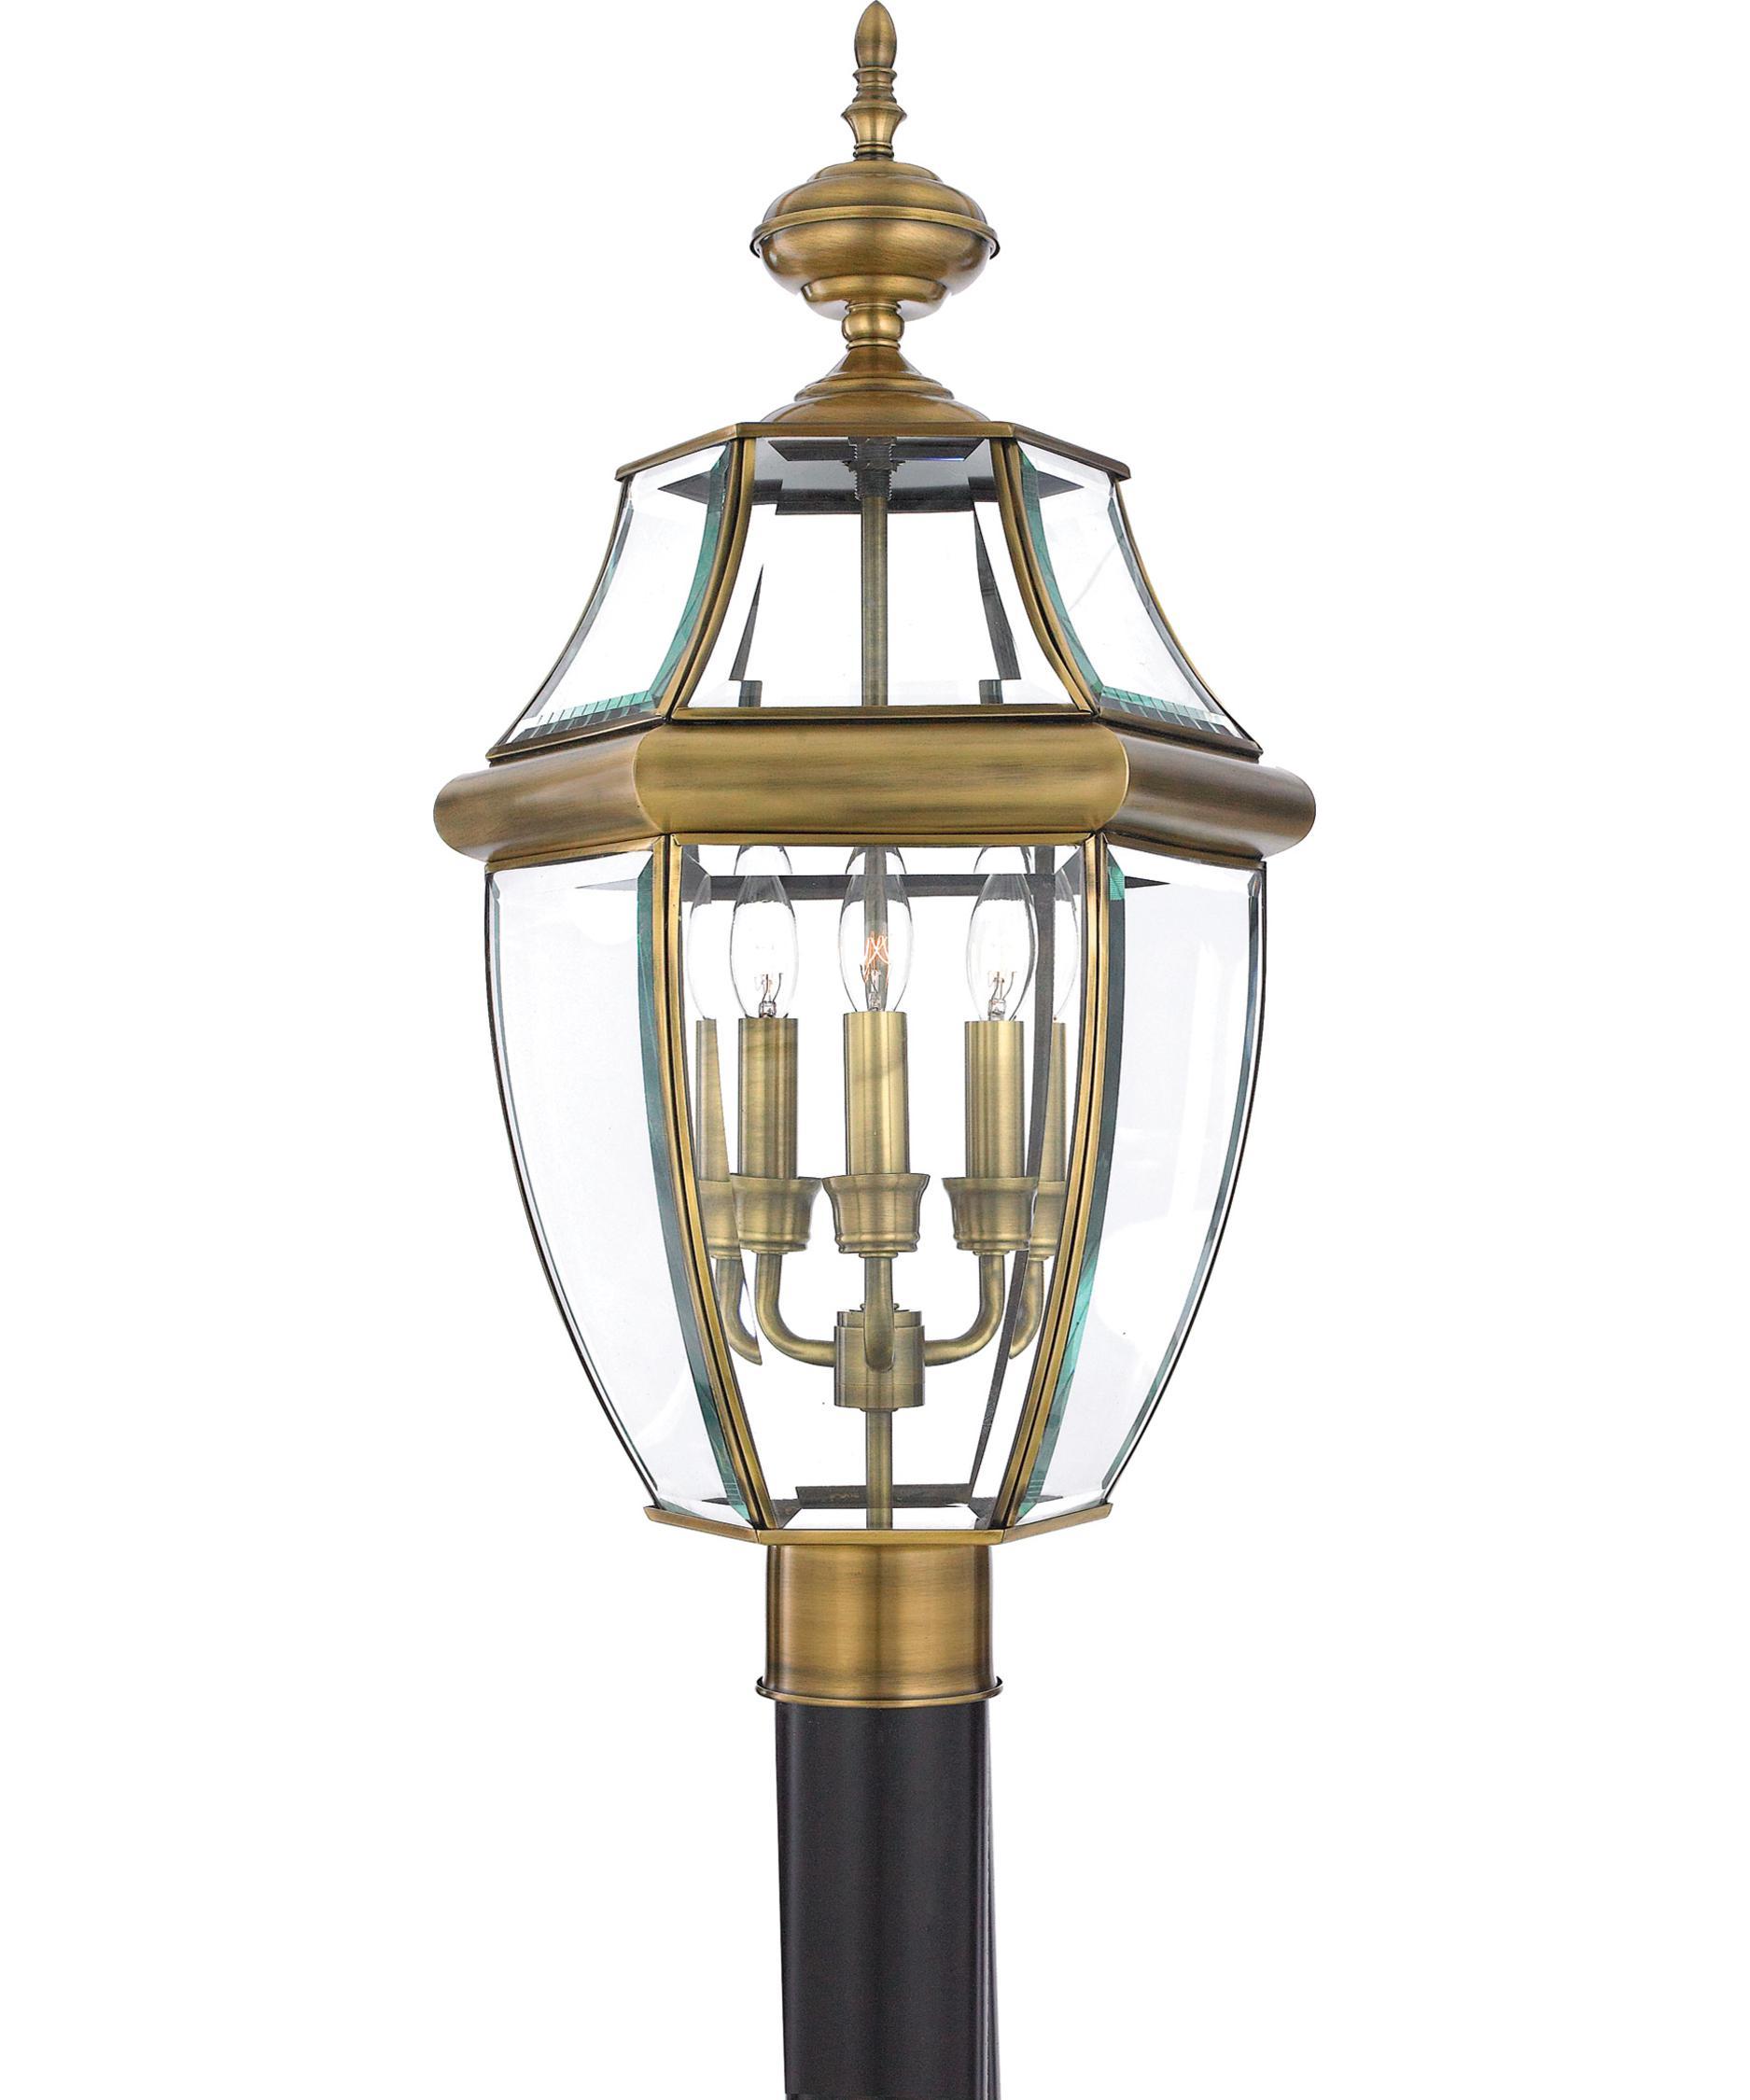 Quoizel Newbury 3 Light Outdoor Post Lamp Capitol